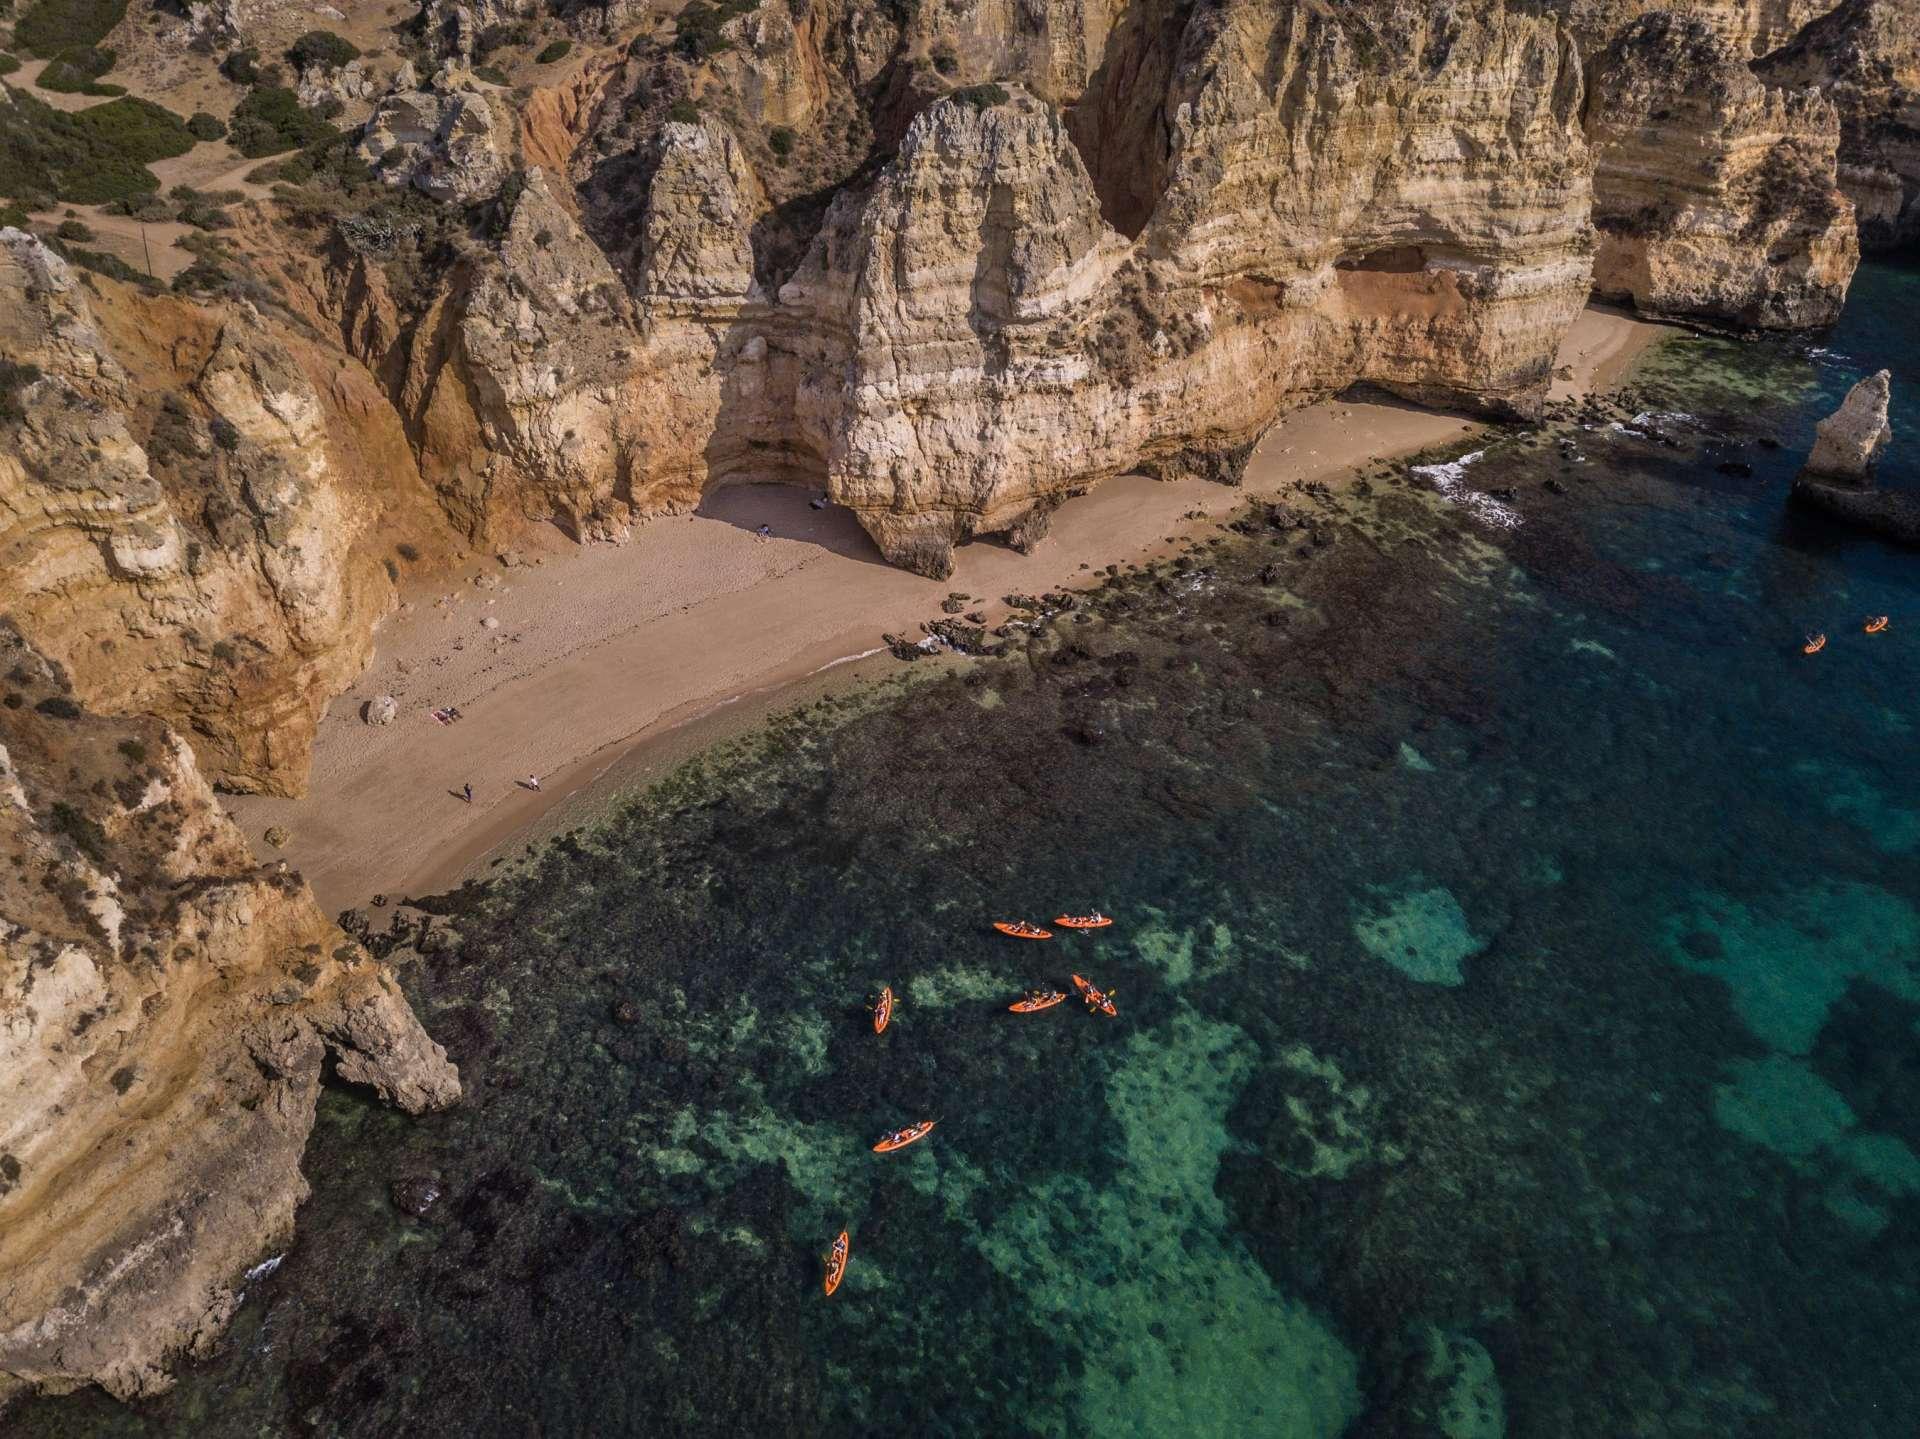 Algarve From Above Drone Photography Enrico Pescantini Praia da Balança